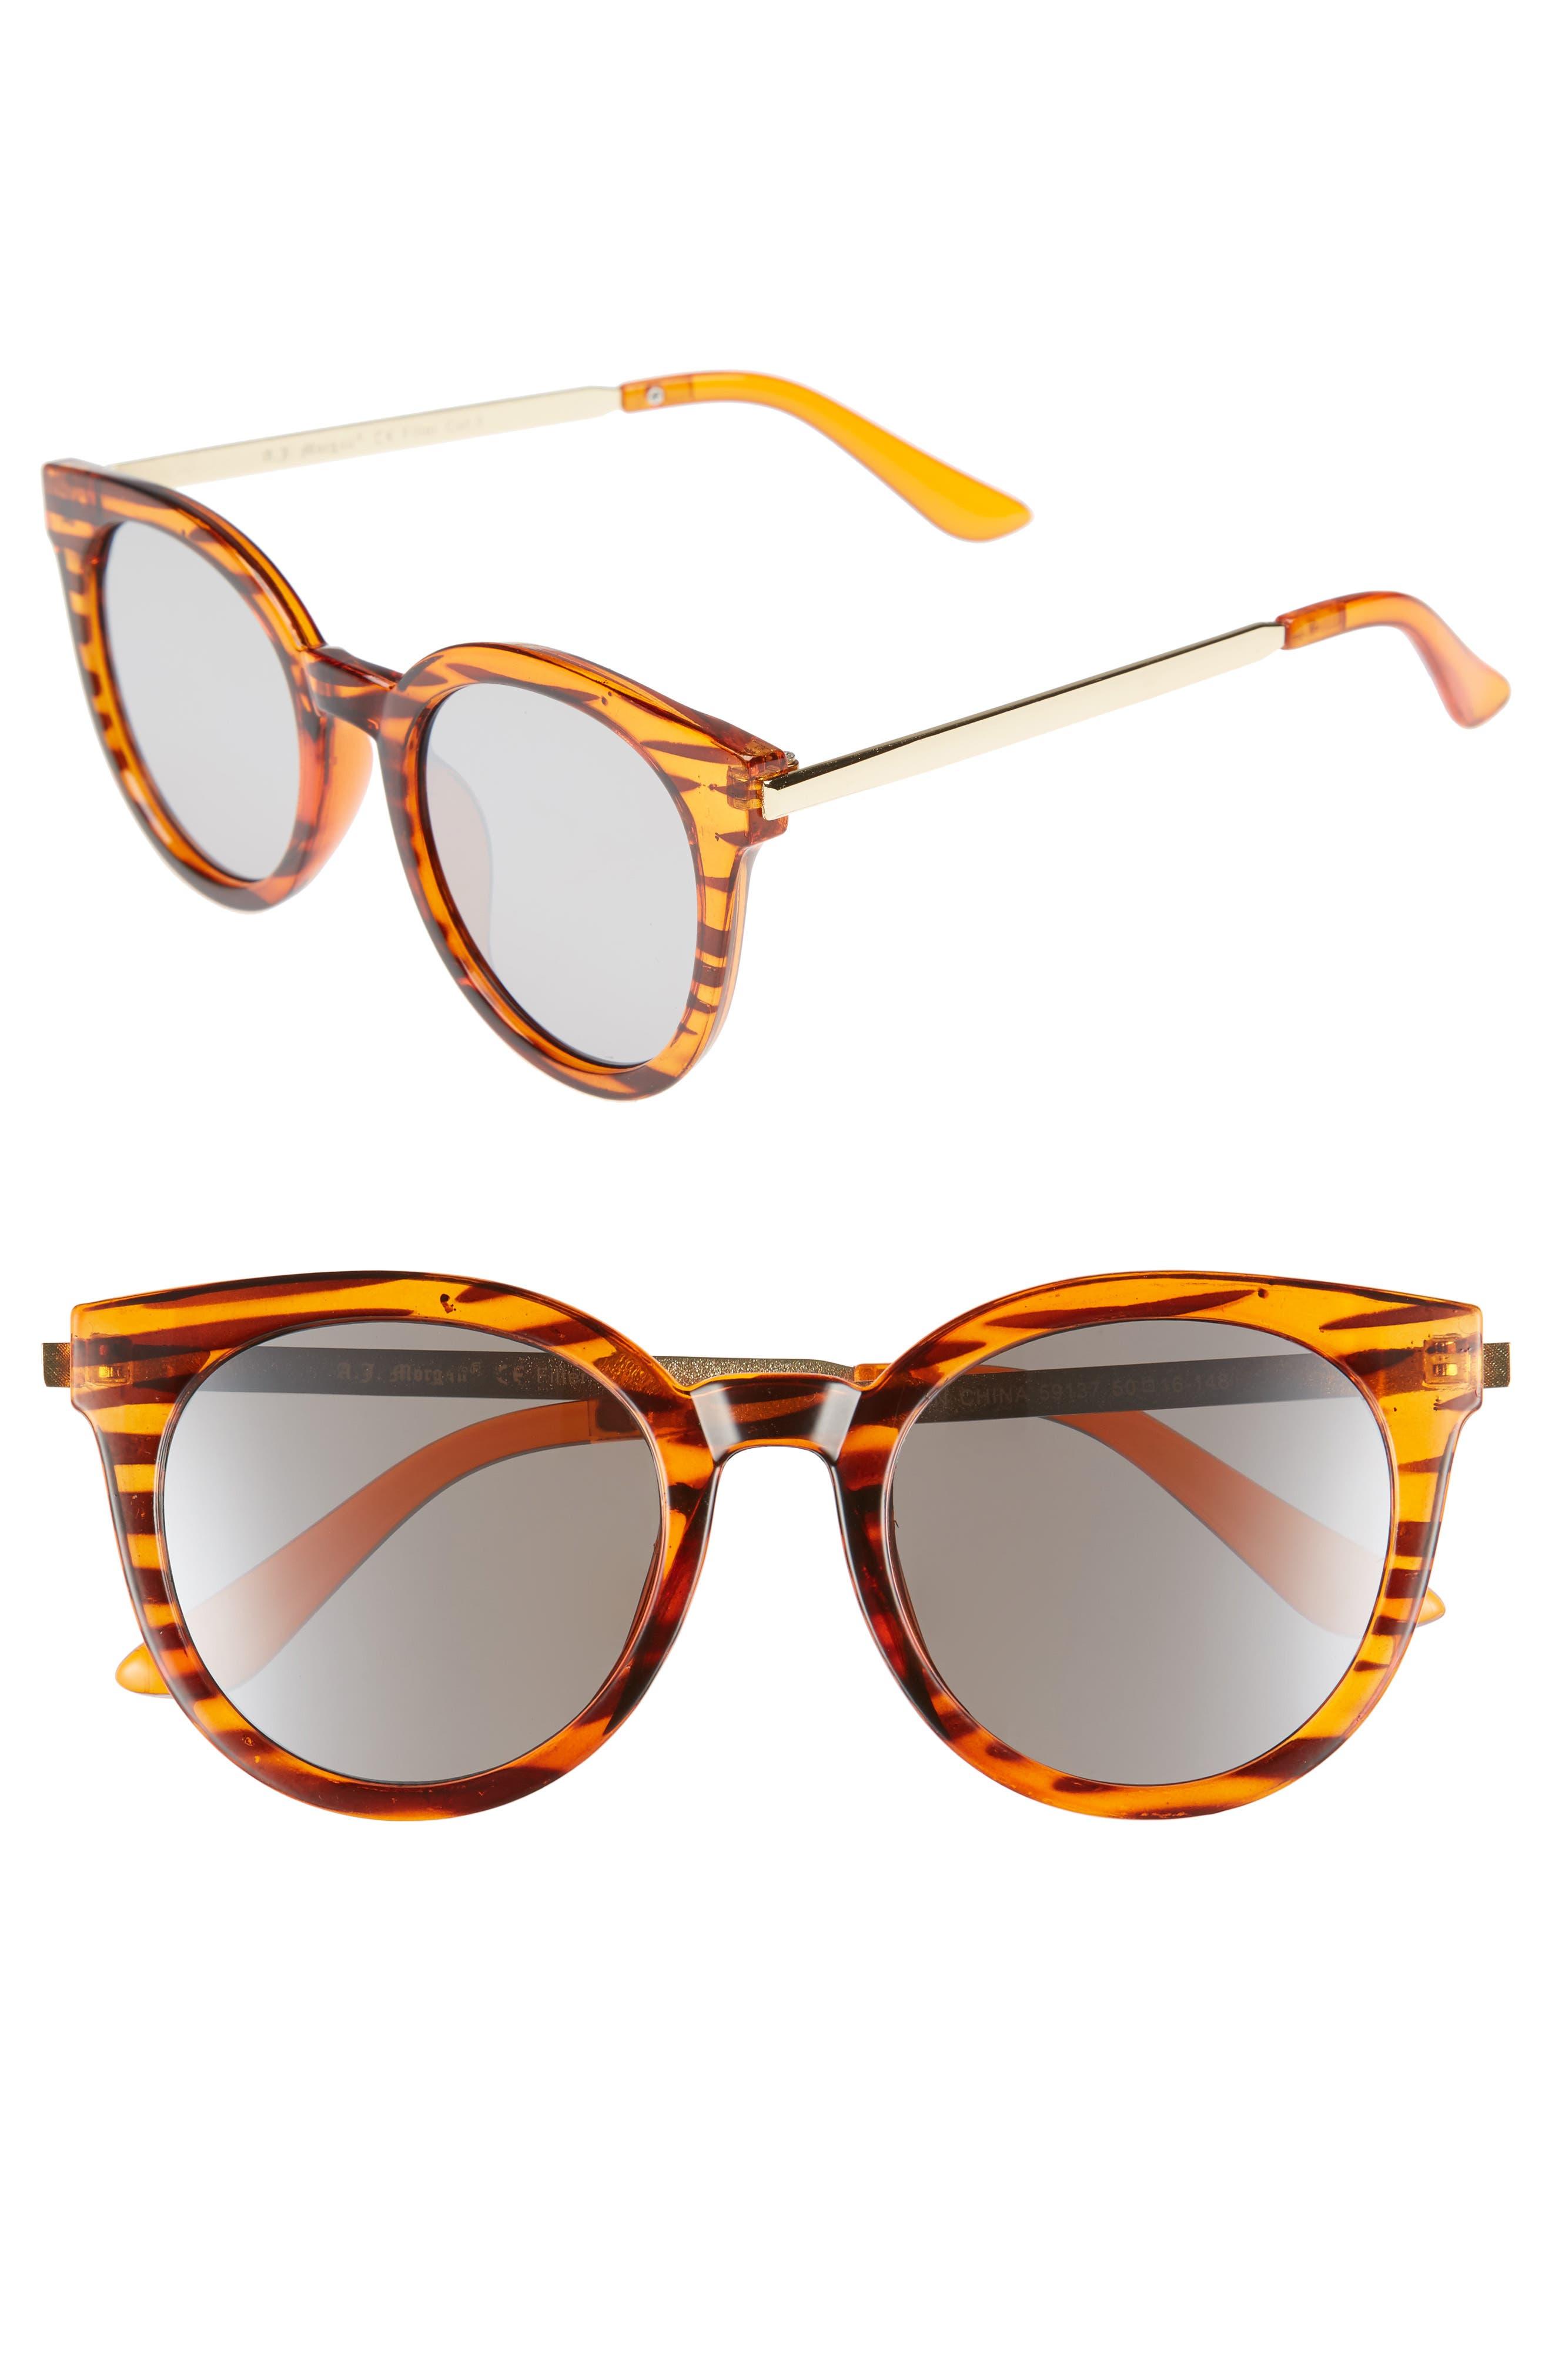 Main Image - A.J. Morgan Hi There 50mm Mirrored Round Sunglasses